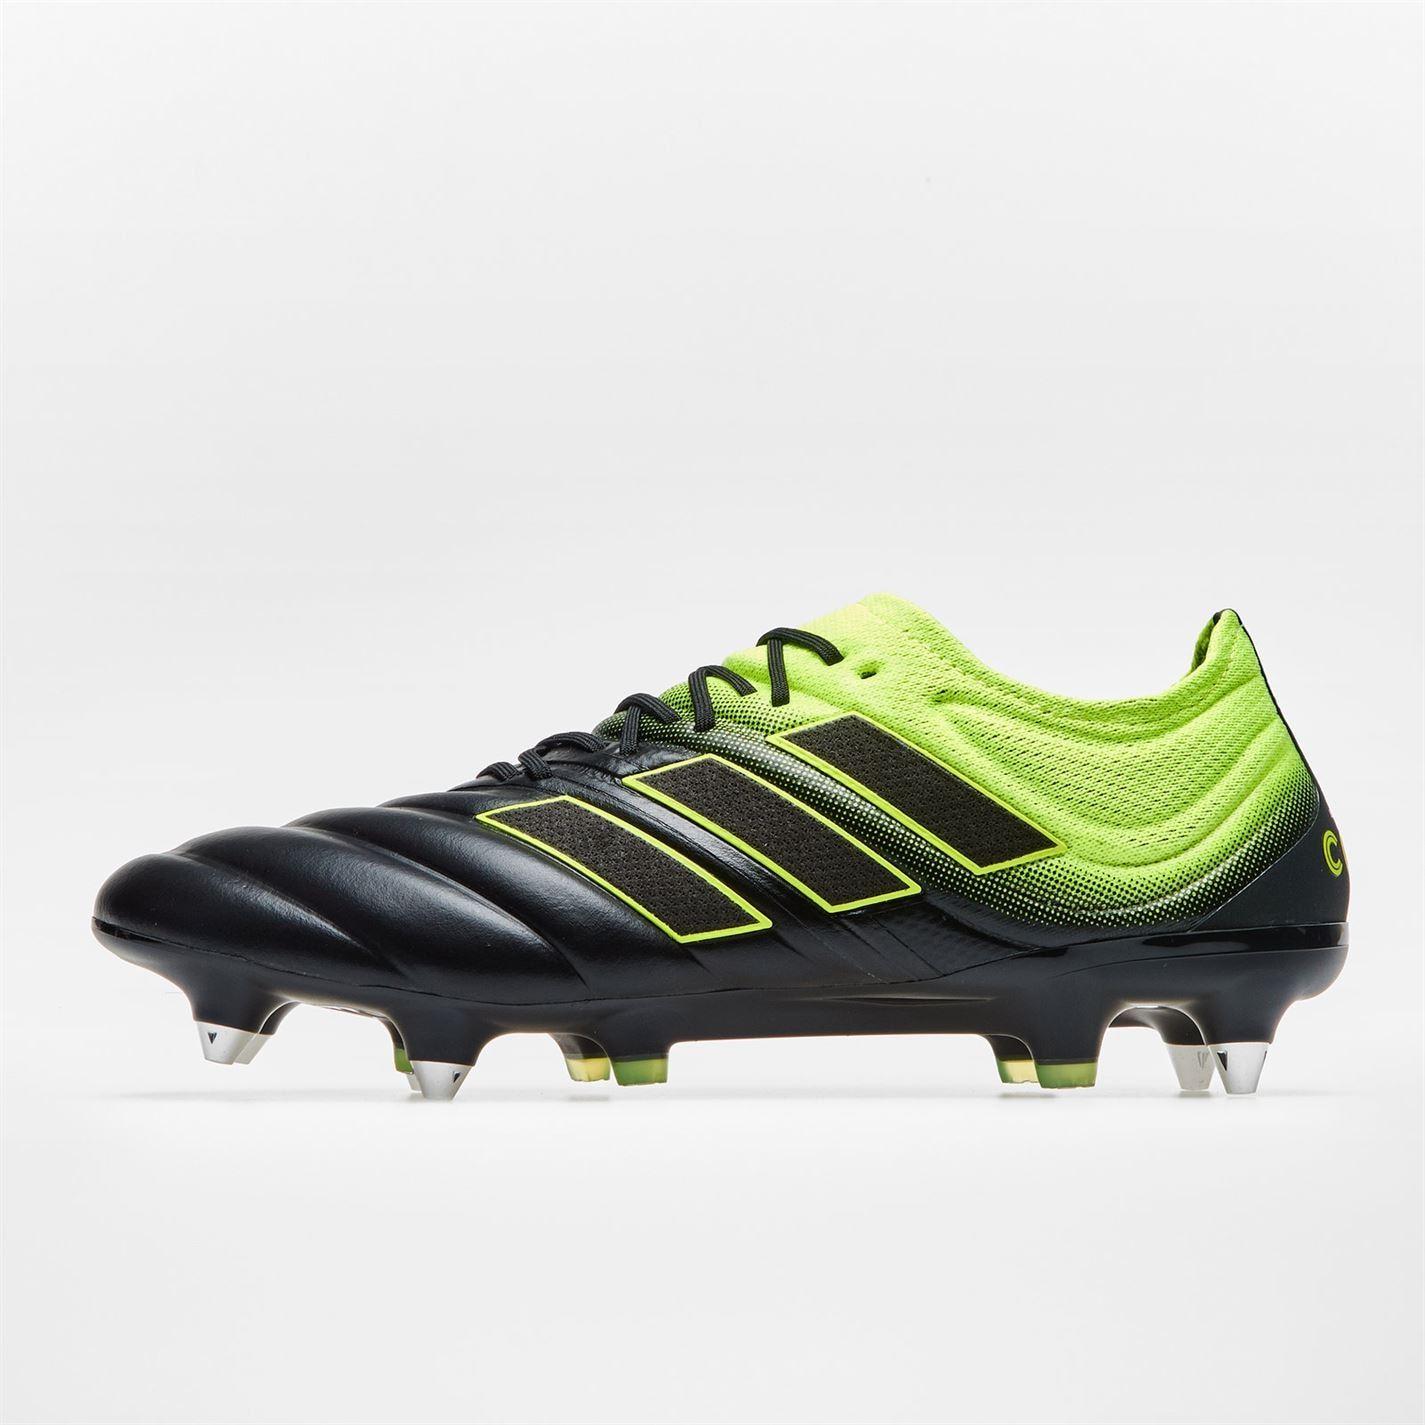 miniature 4 - Adidas-Copa-19-1-Homme-pignon-fixe-Terre-Ferme-Chaussures-De-Football-Chaussures-de-Foot-Crampons